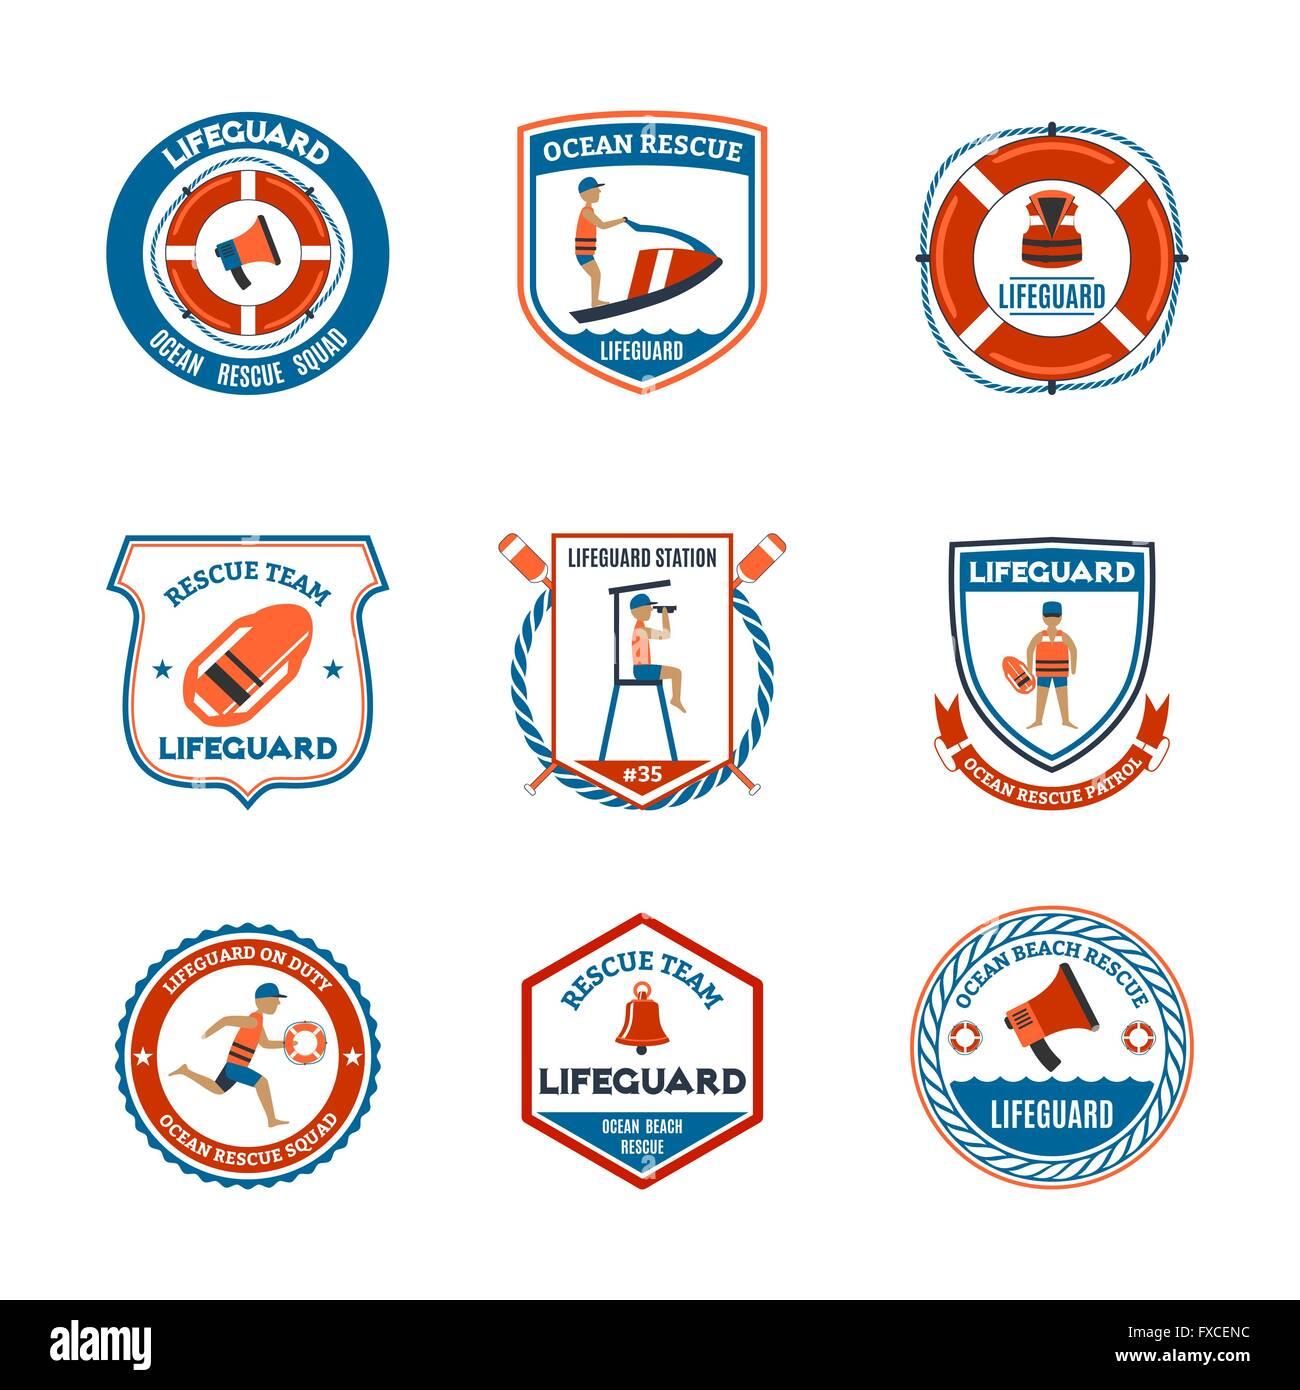 6a3750f838b Lifeguard Emblems Set Stock Vector Art   Illustration